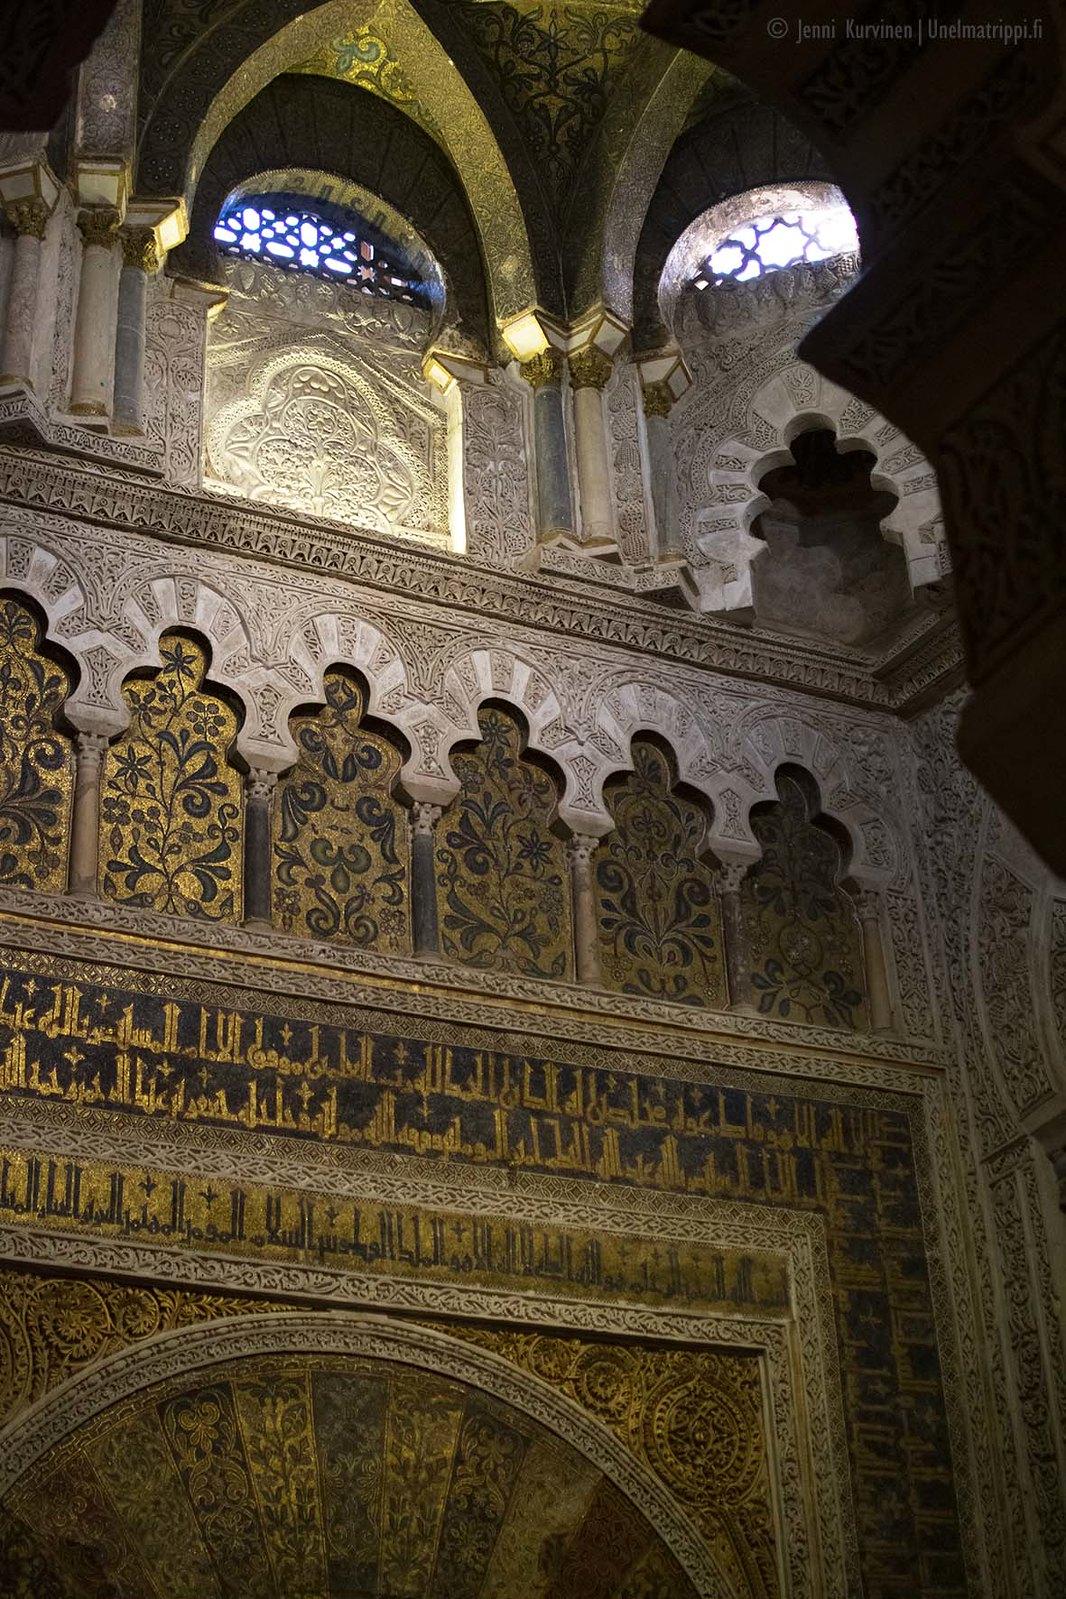 20190210-Unelmatrippi-La-Mezquita-Cordoba-DSC0238